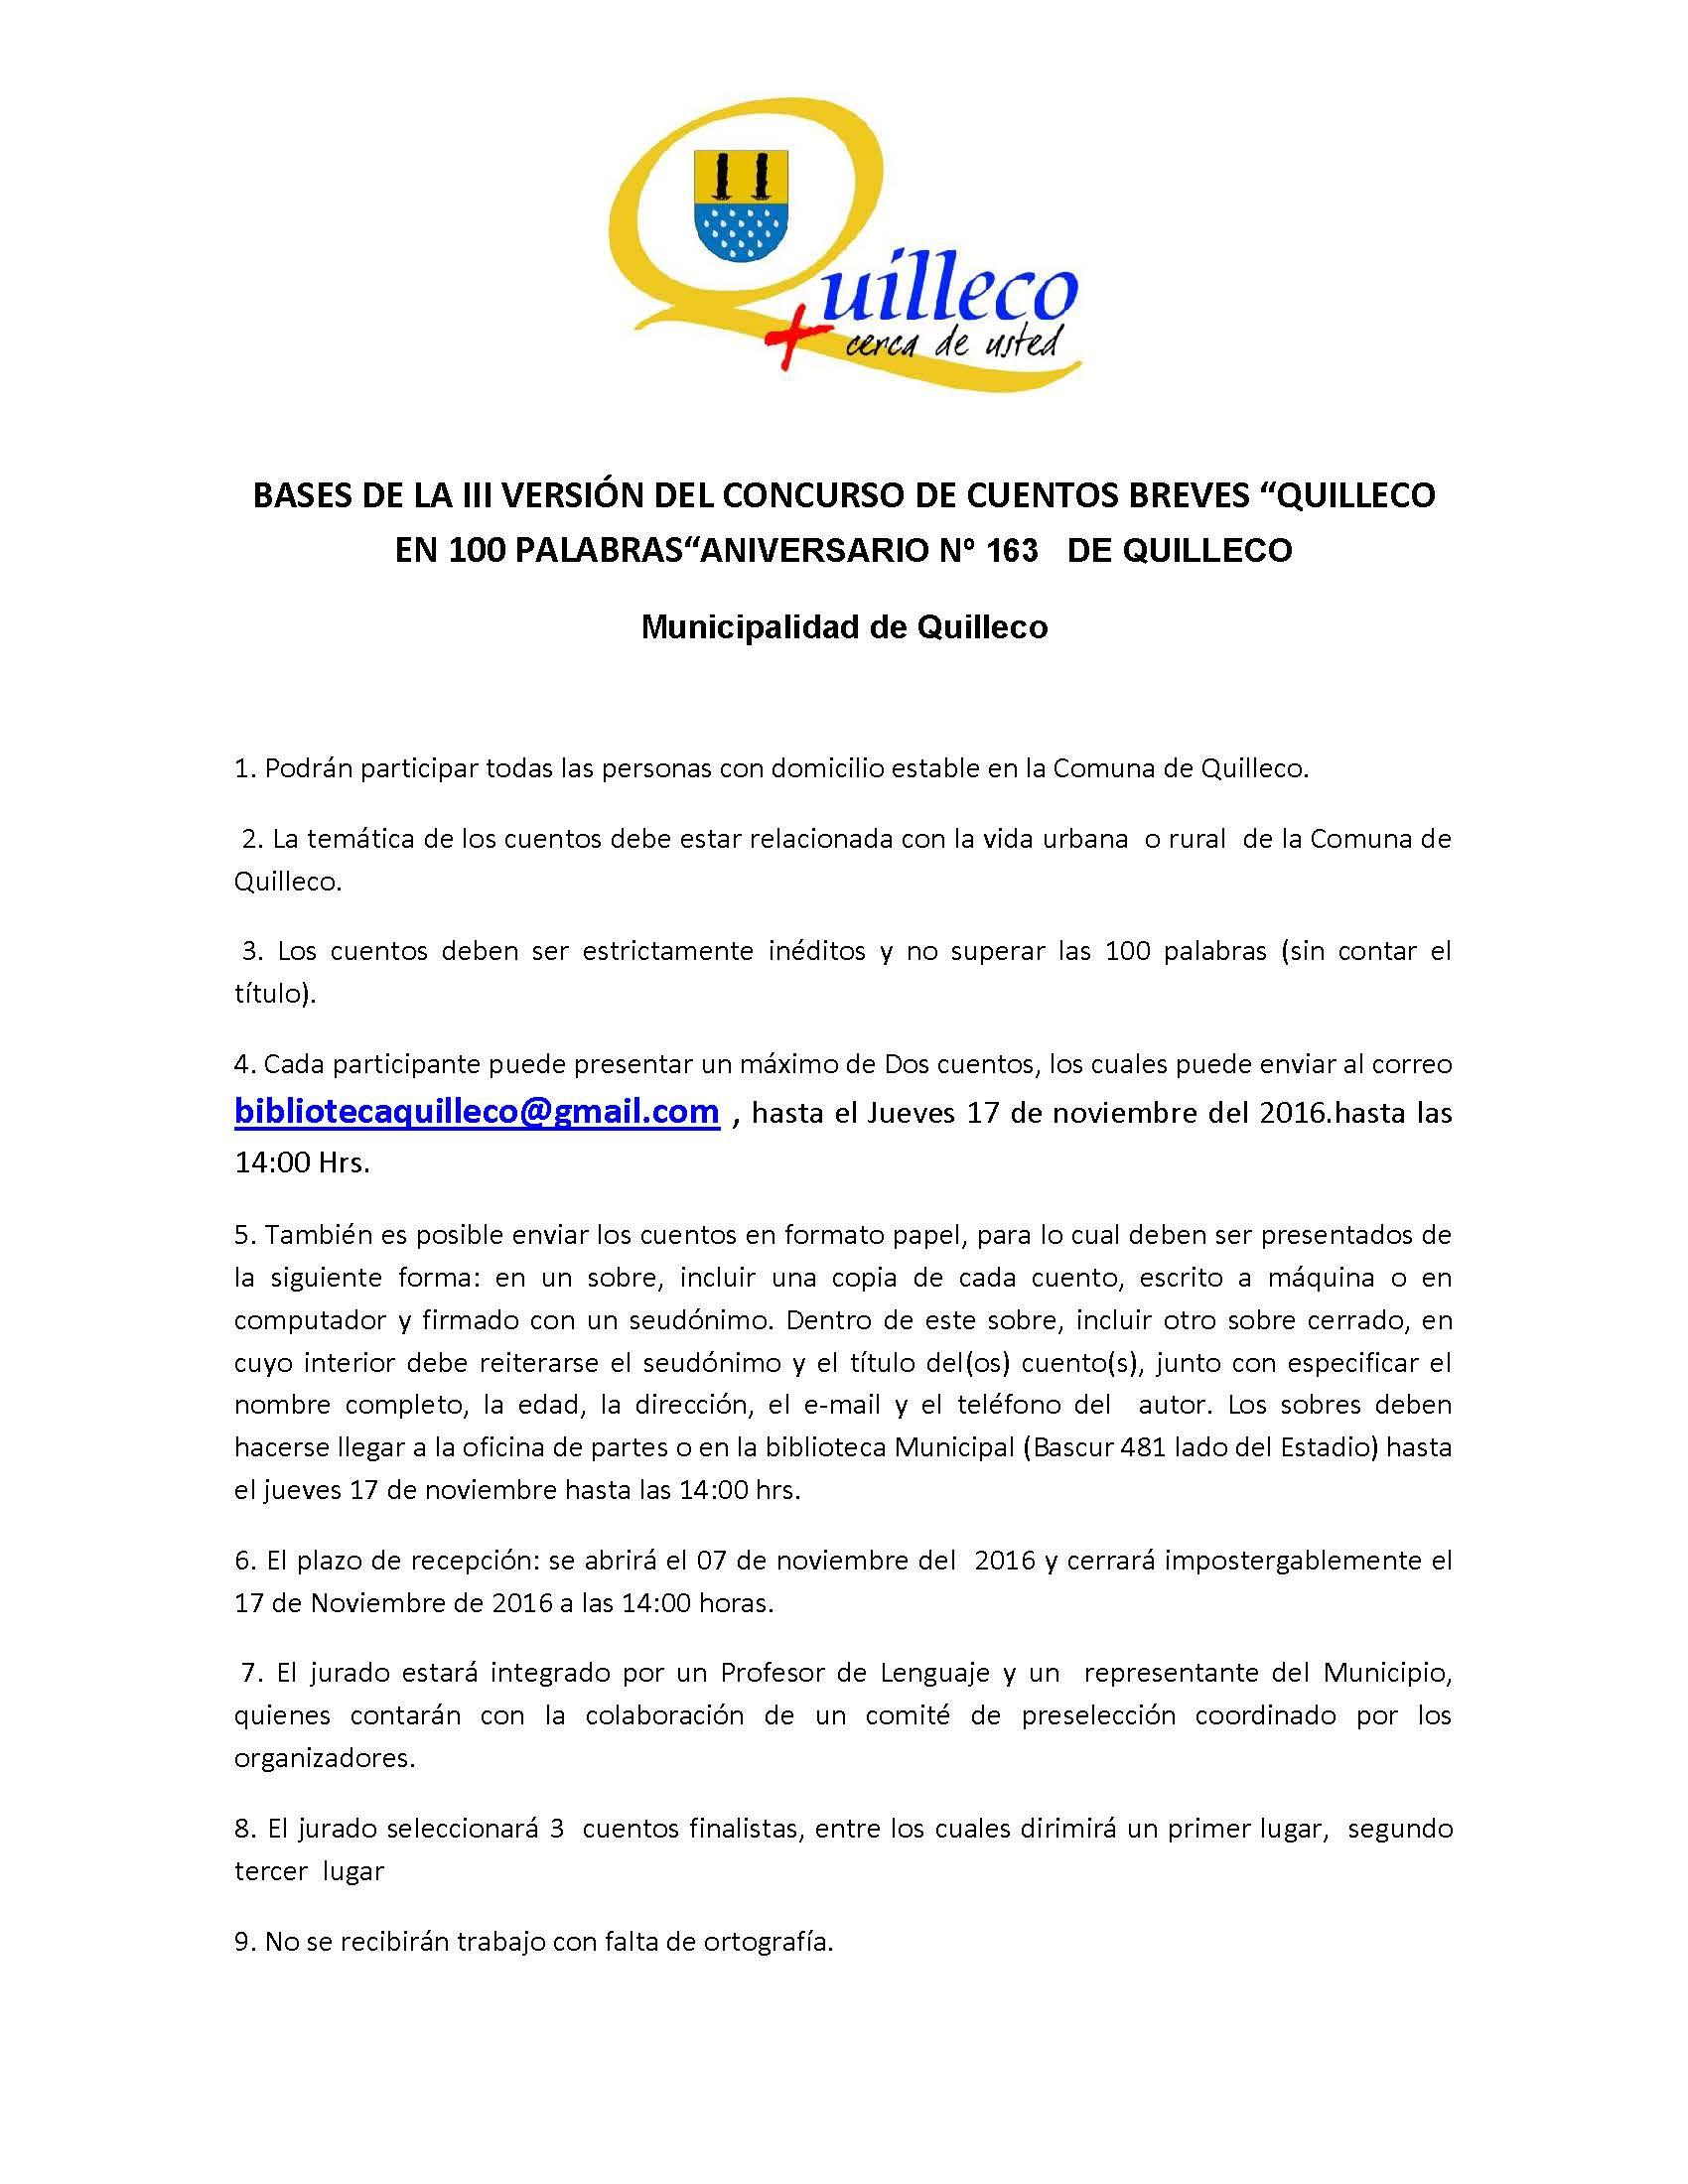 quilleco-en-100-palabras_pagina_1